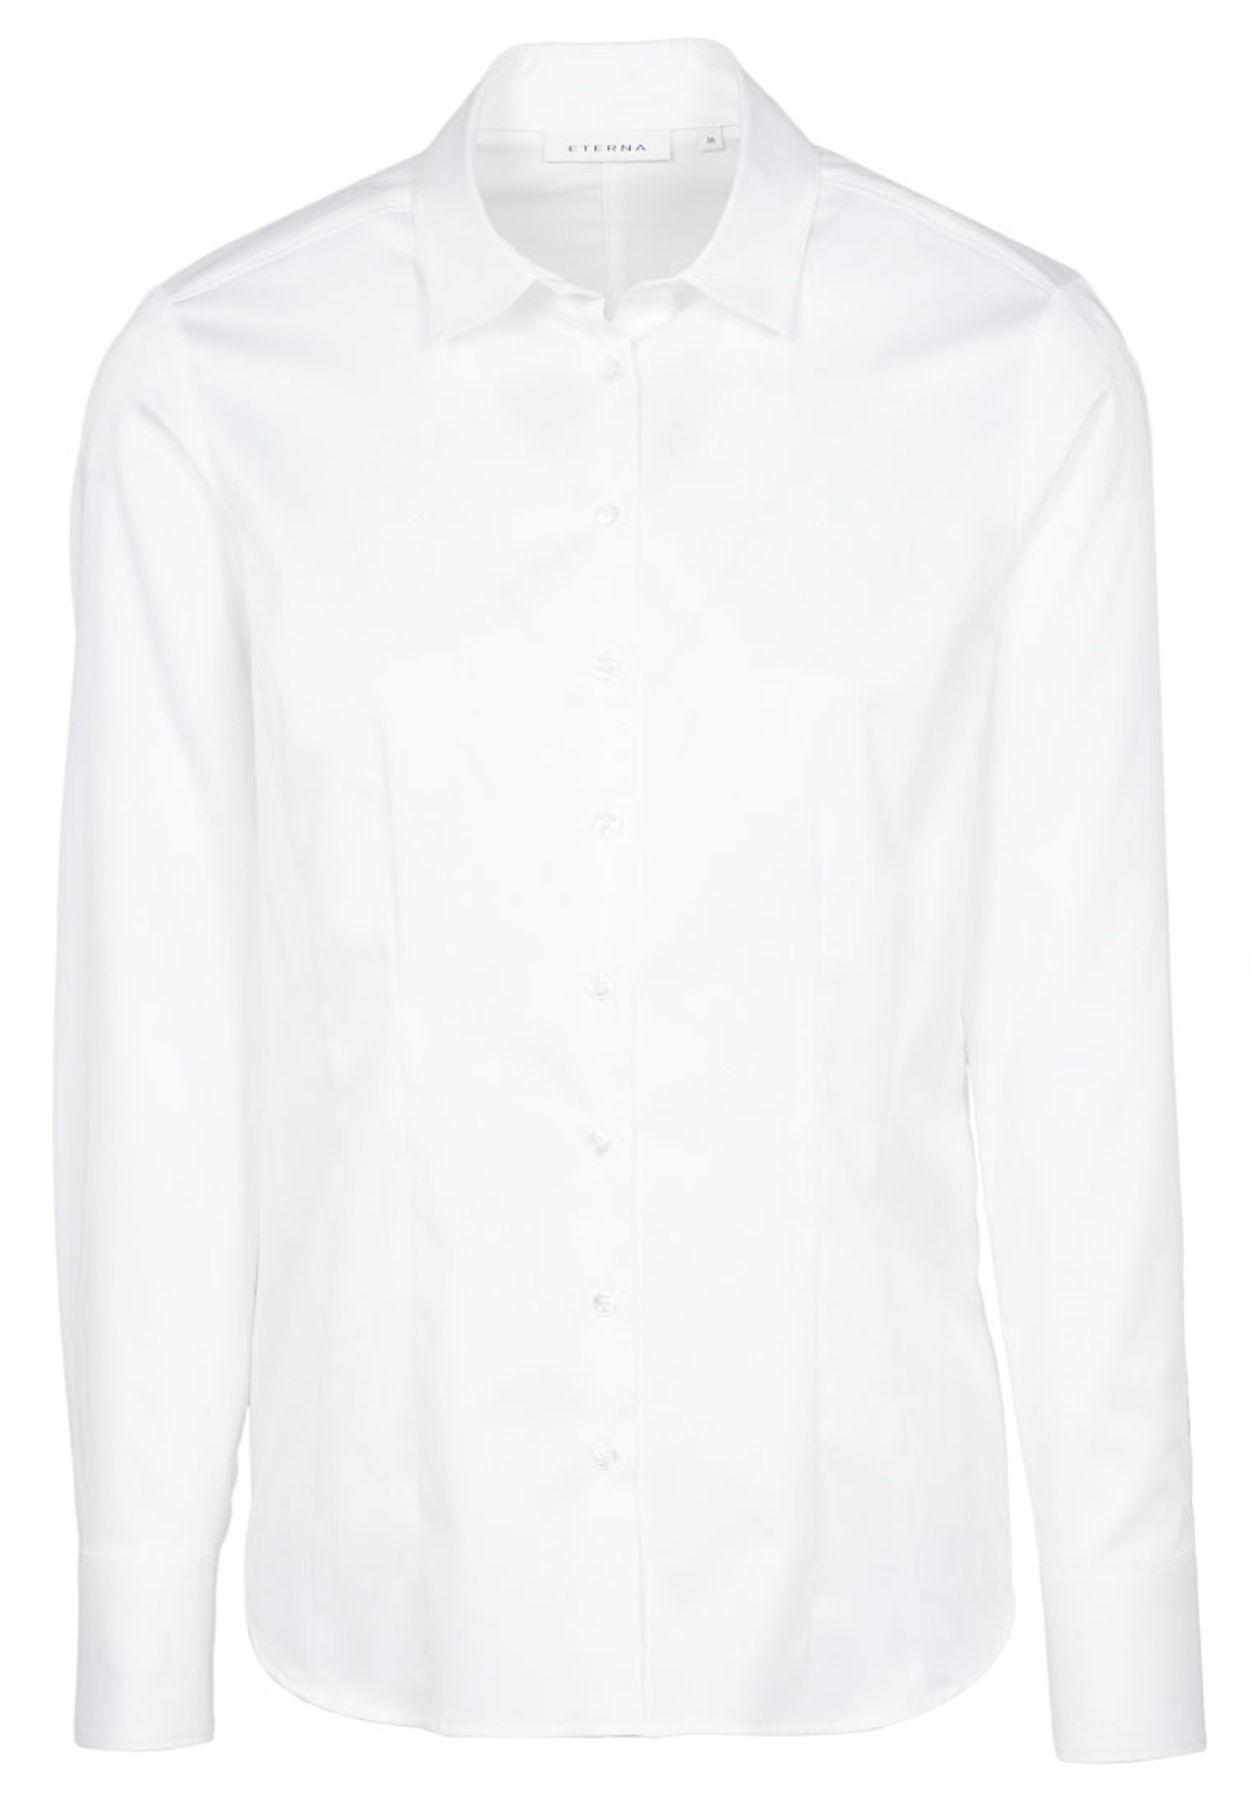 Eterna - Comfort Fit - Damen Langarm Bluse in Weiß (5585 D749) – Bild 1